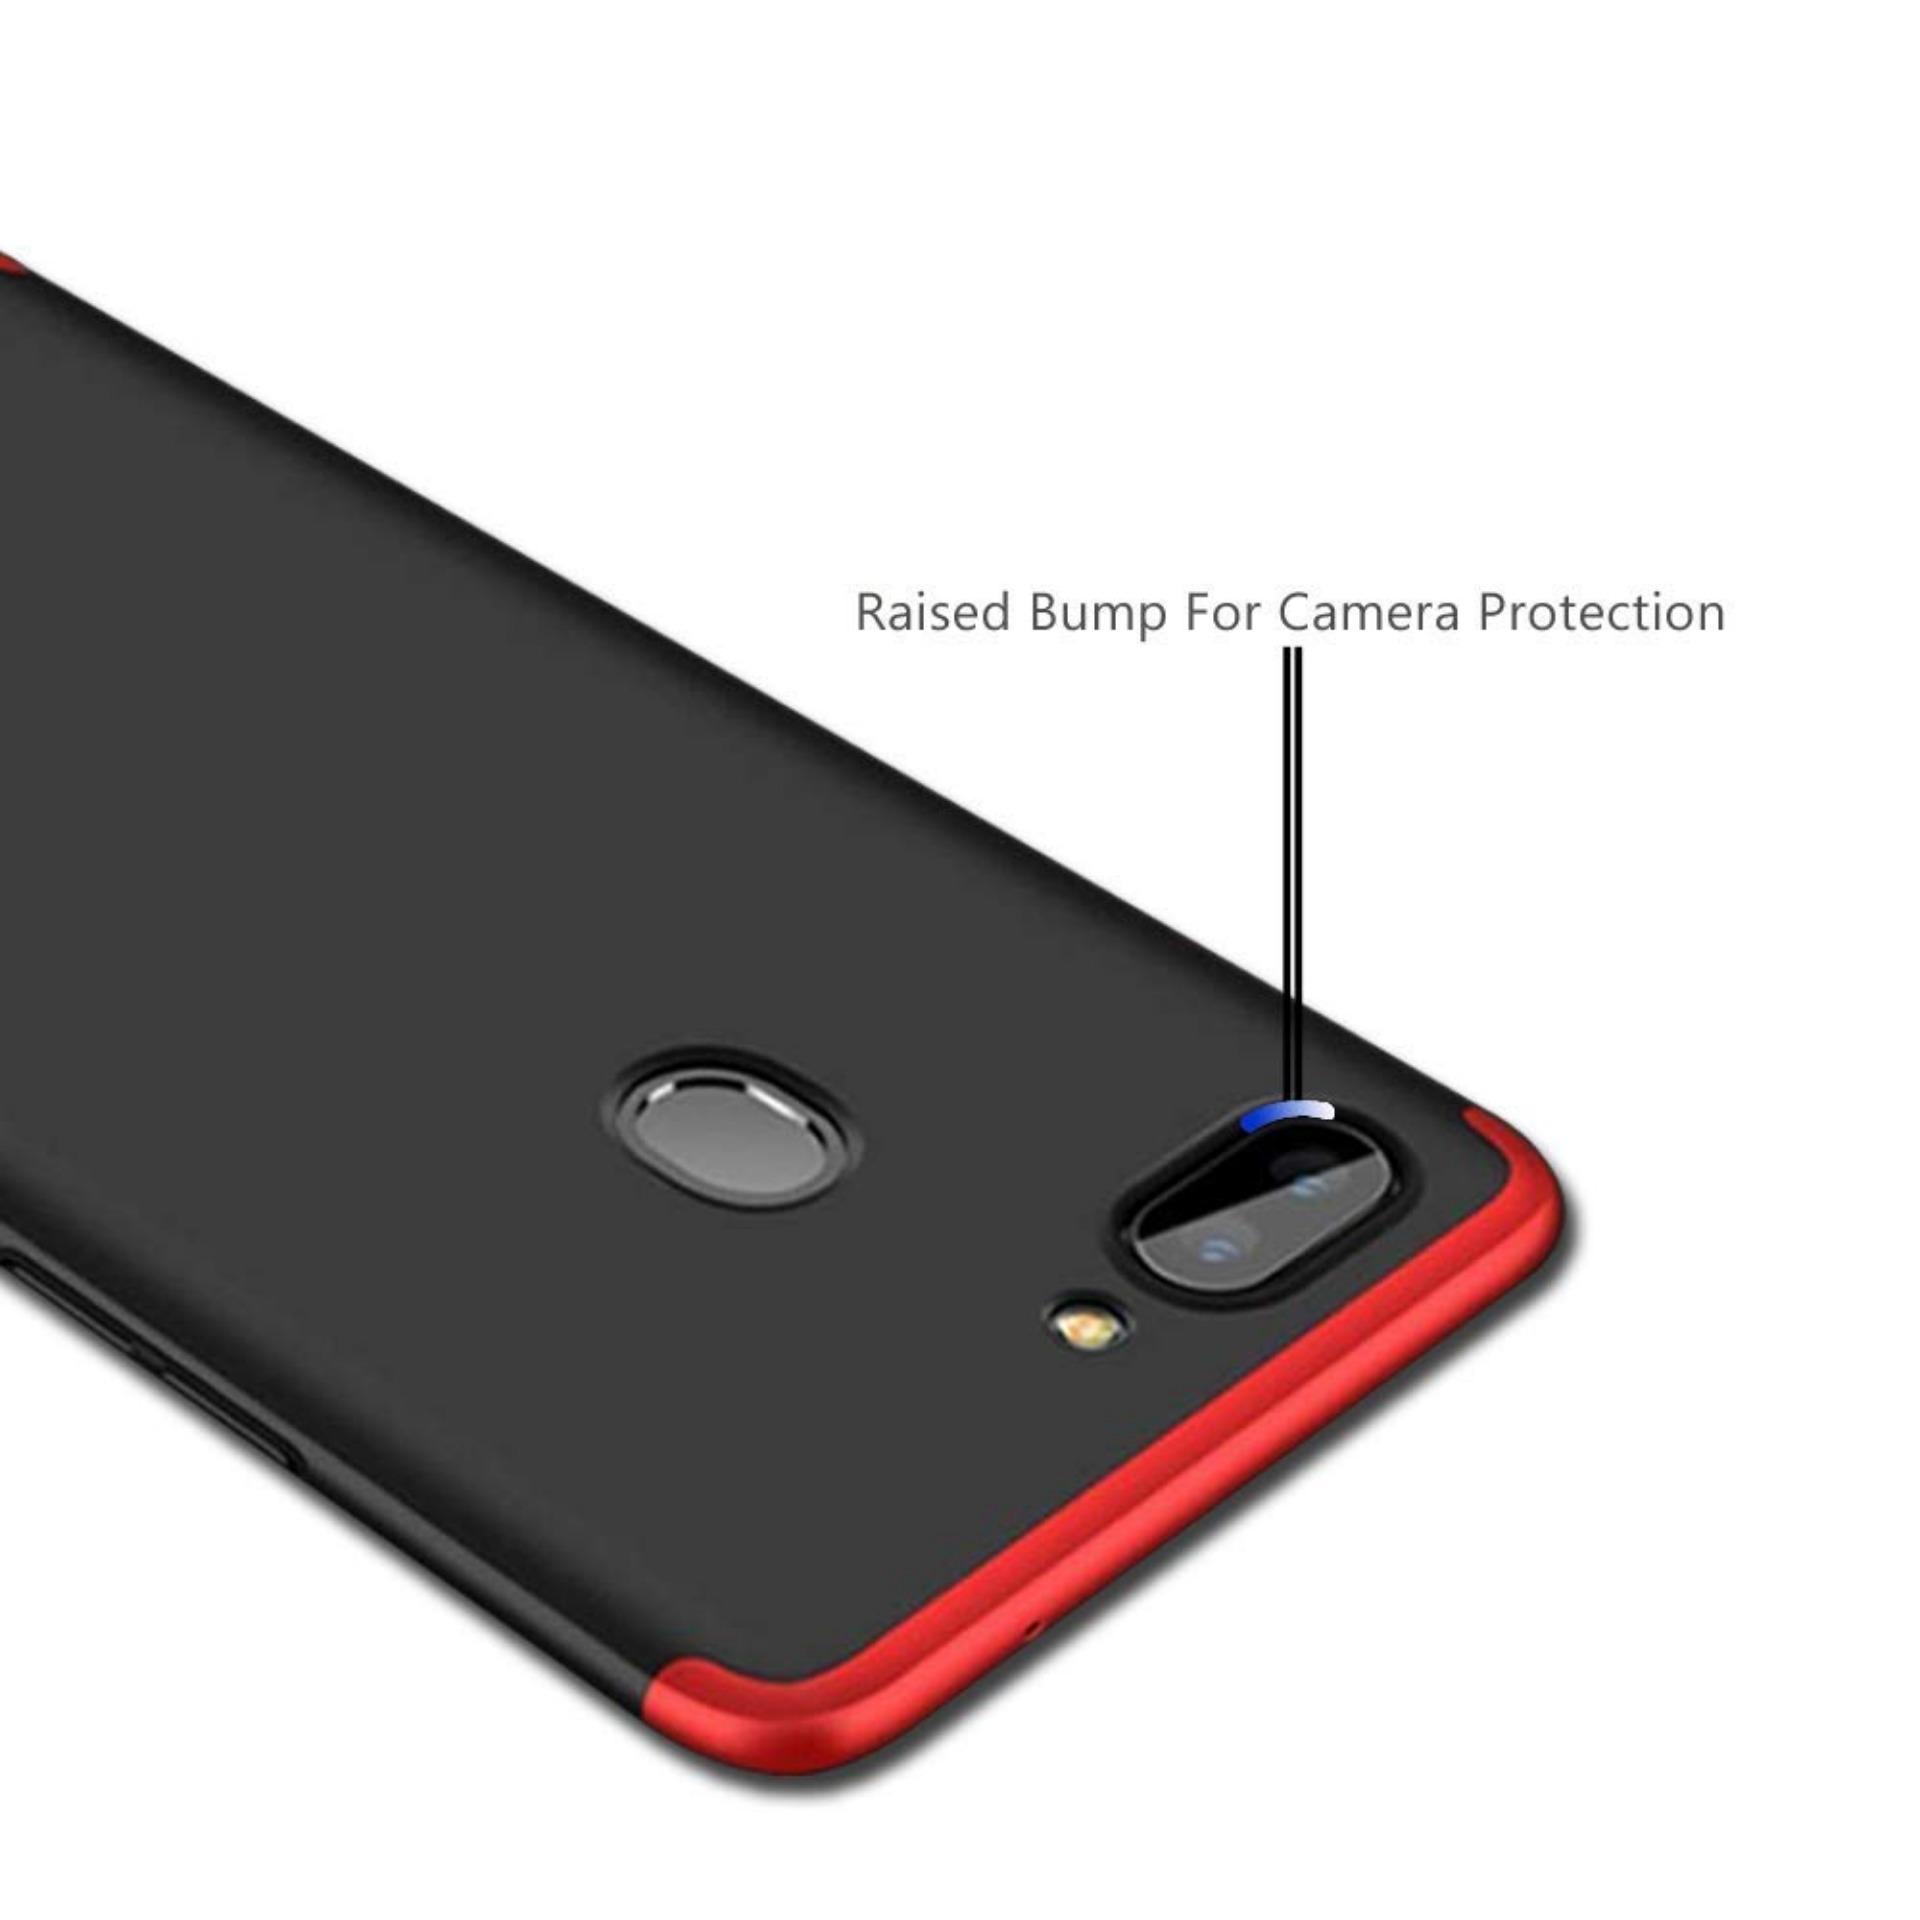 Premium Case 360 Degree Full Protection Super Slim Anti Slip Hard Back Case Cover For Oppo Realme C1 - Random Color + Free Tempered Glass - 4